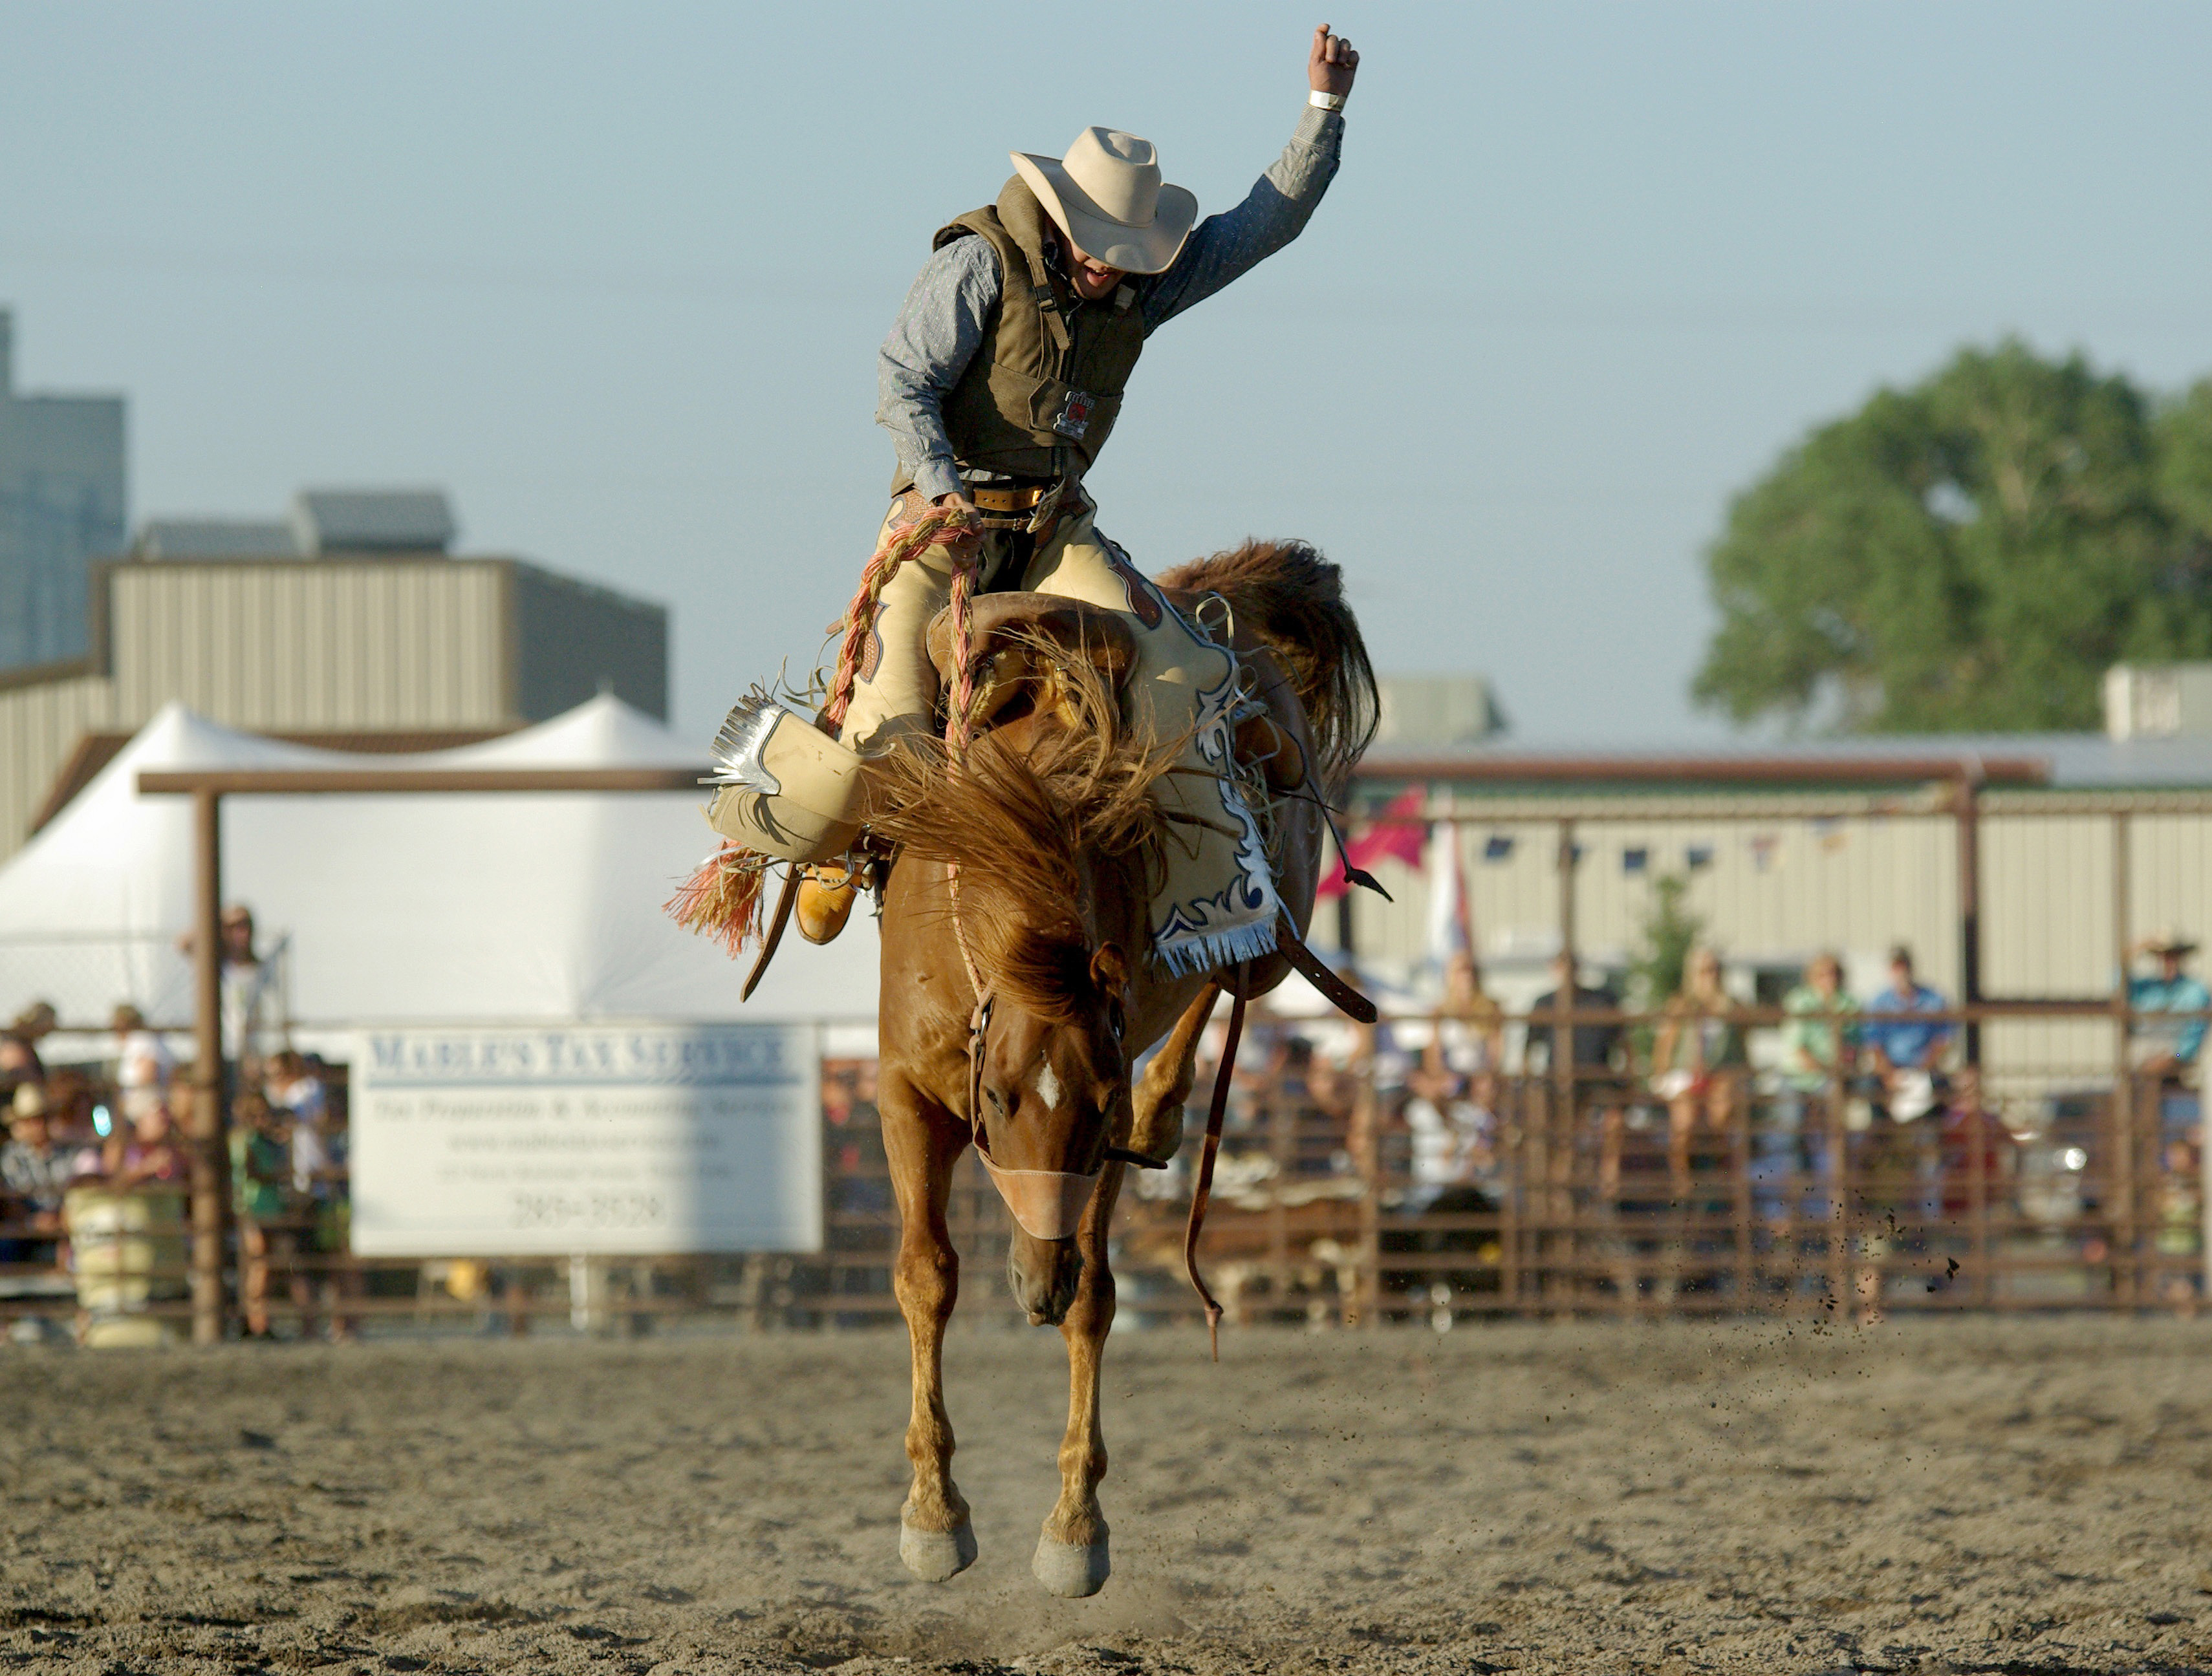 Bucking horse - Wikipedia